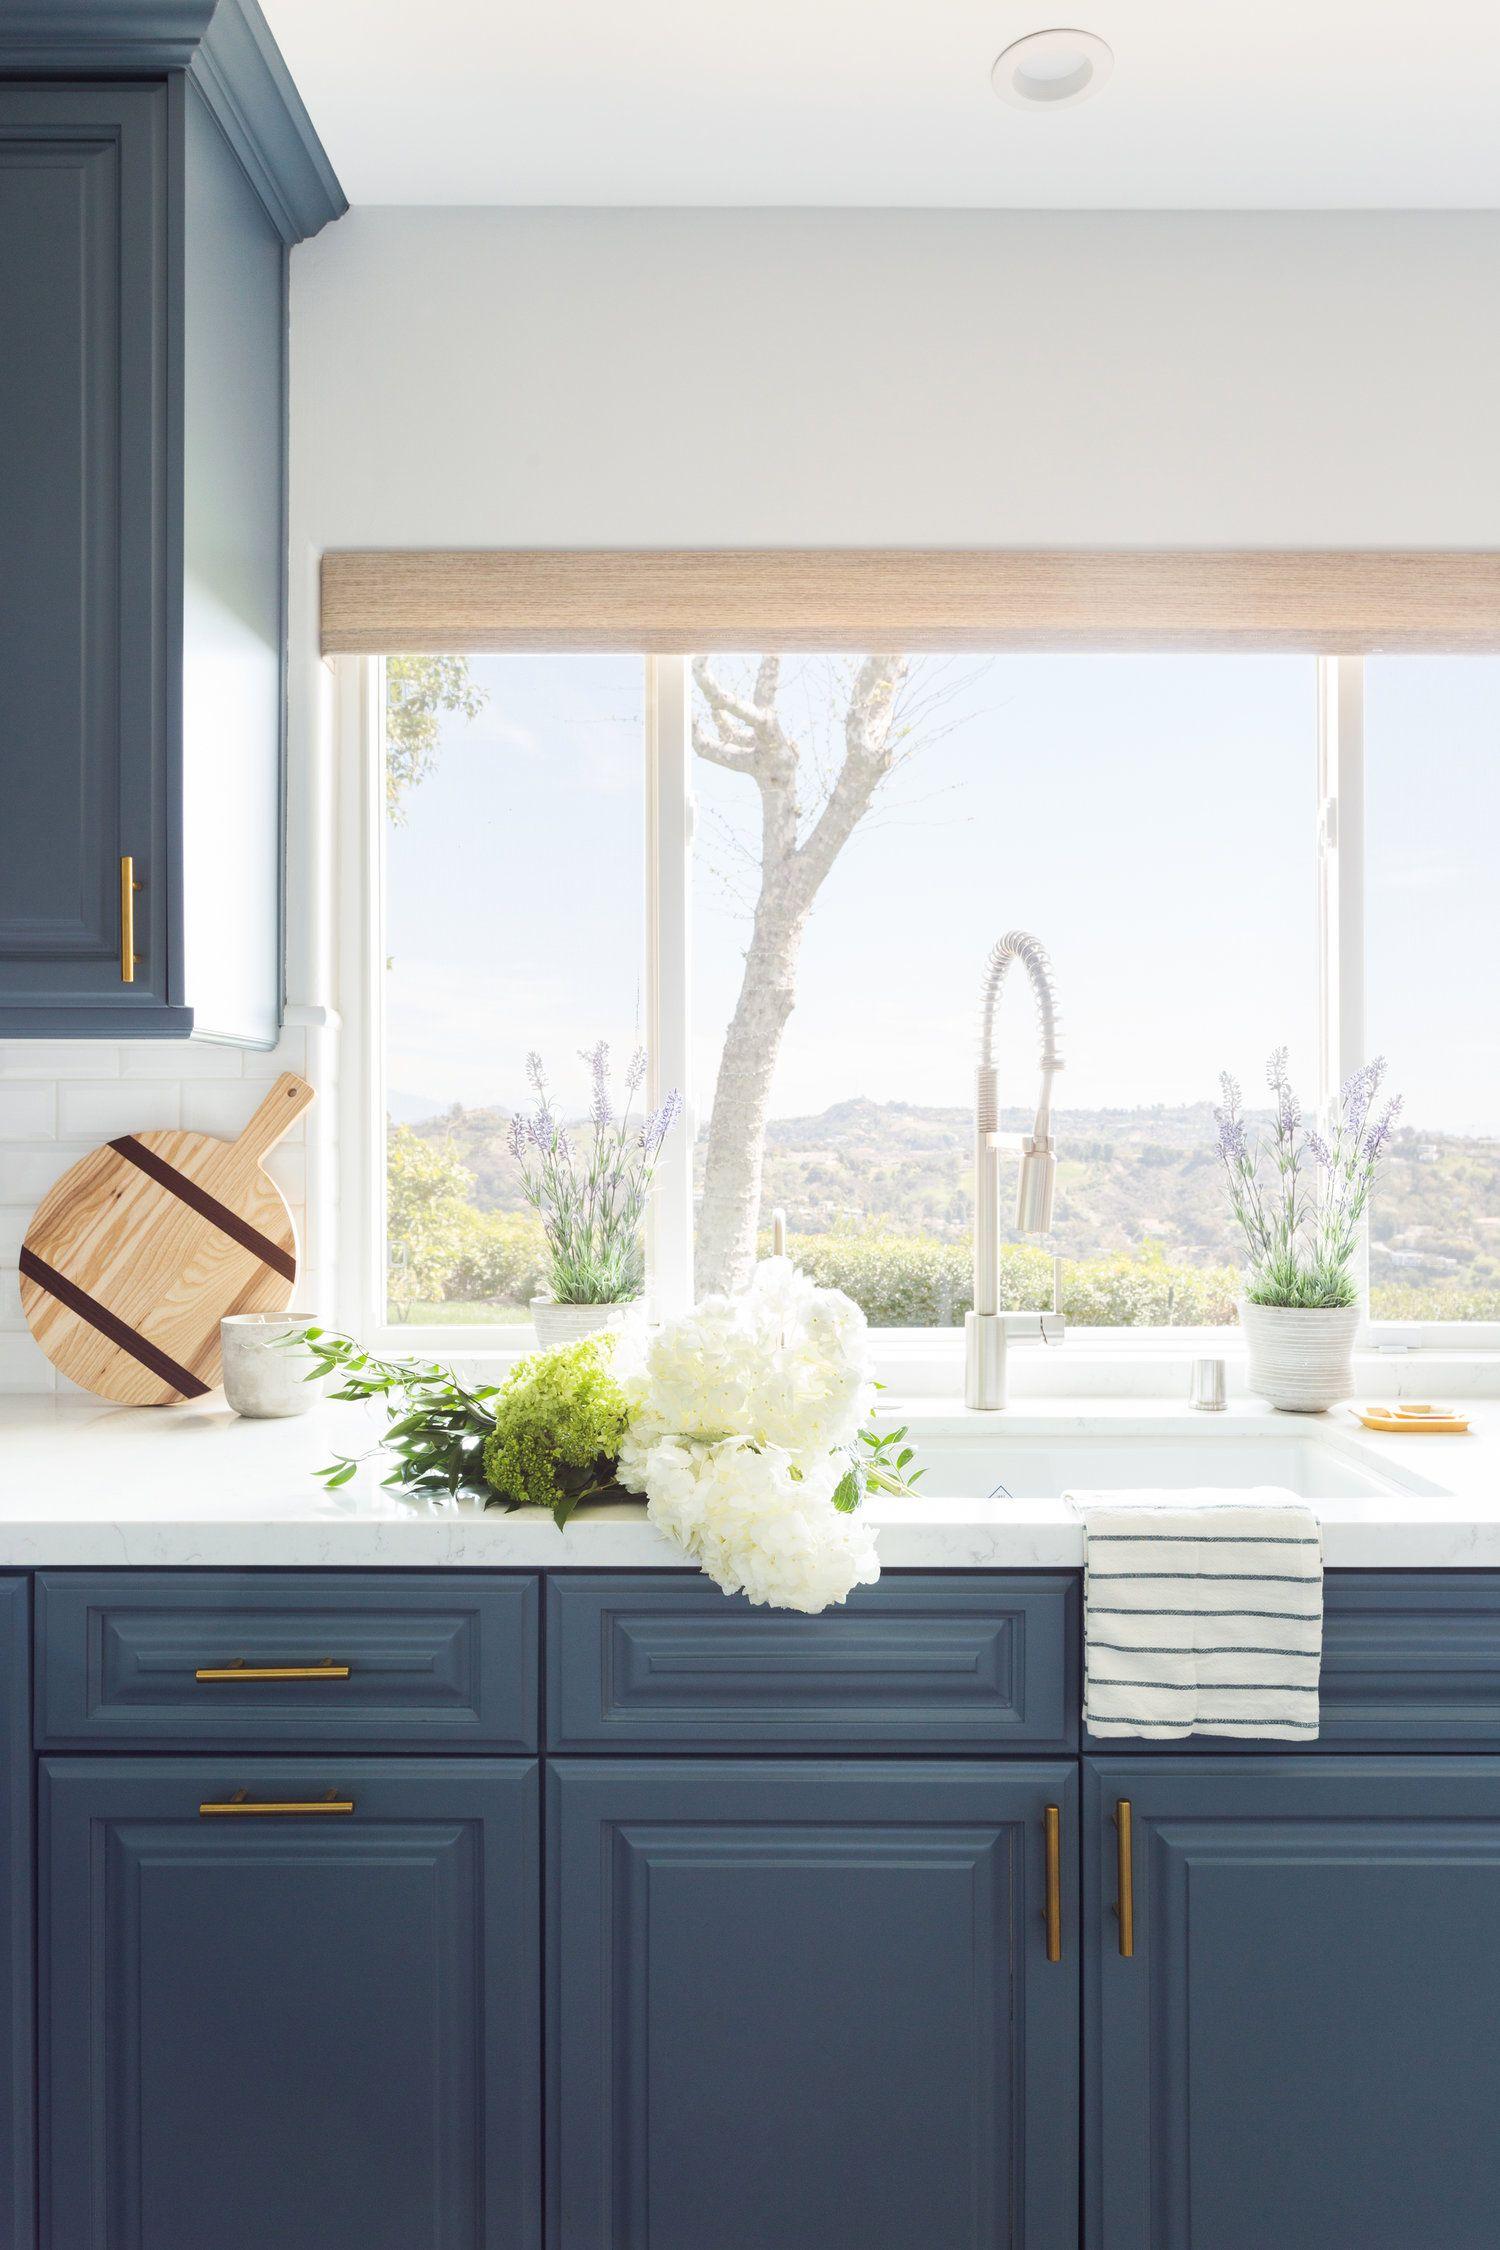 The Best Sources For Modern Minimal Cabinet Hardware Navy Blue Kitchen Cabinetr Kitchen Inspiration Design Kitchen Design Styles Beautiful Kitchen Cabinets